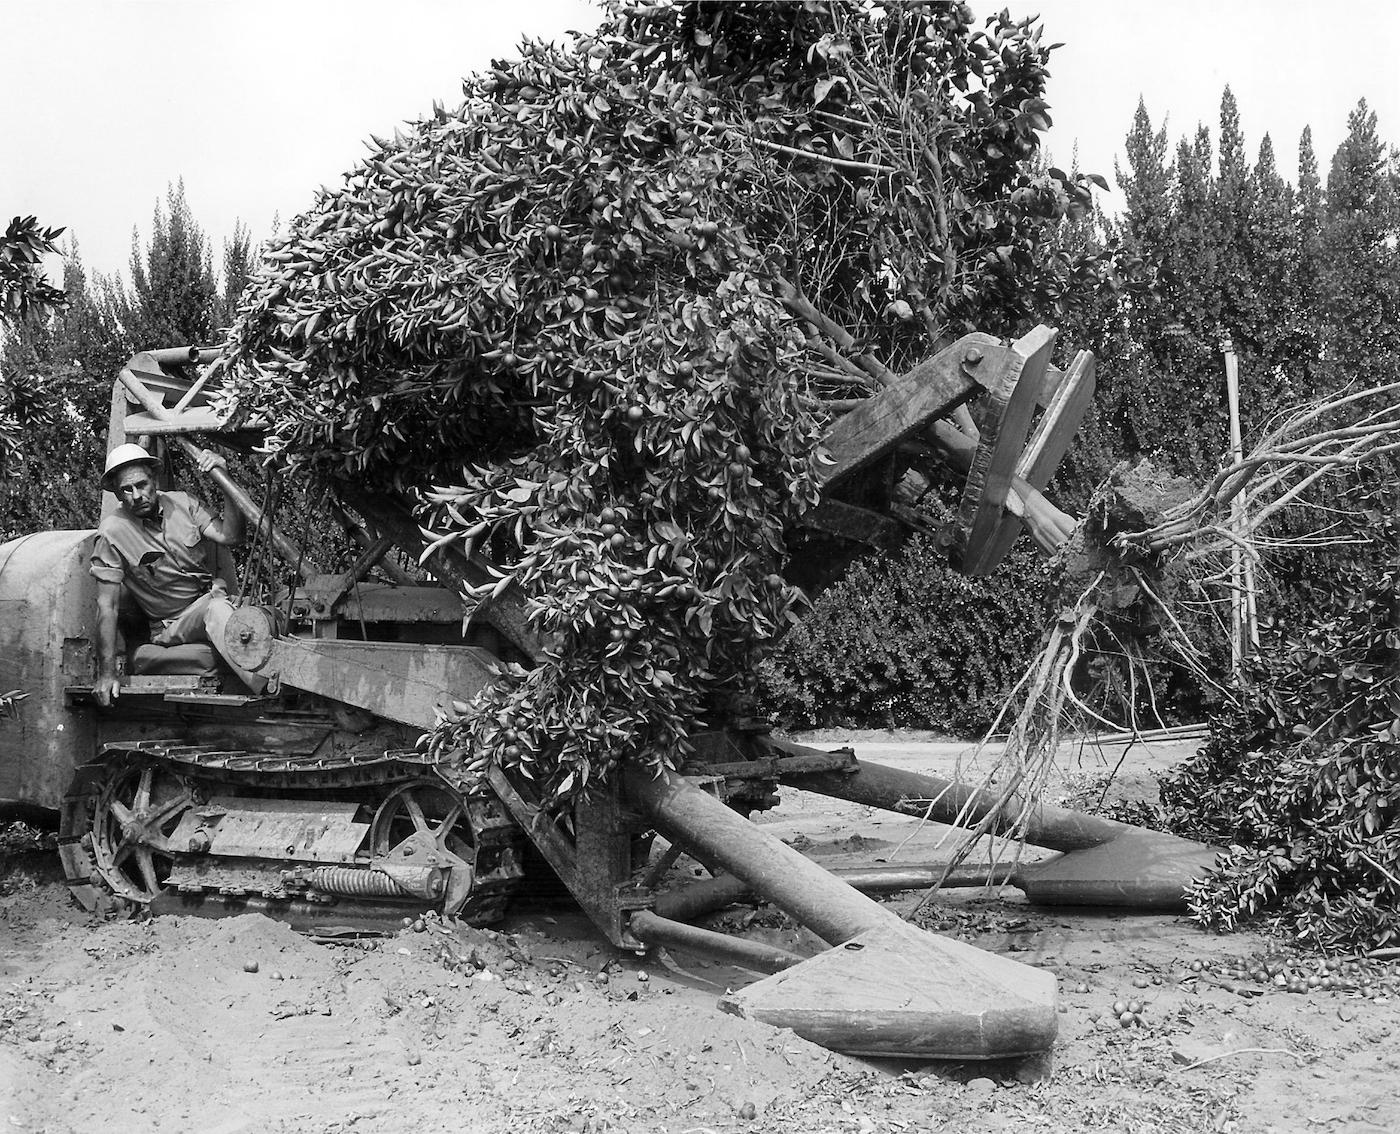 Weldon Field uprooting an orange tree (courtesy Yale University Press)